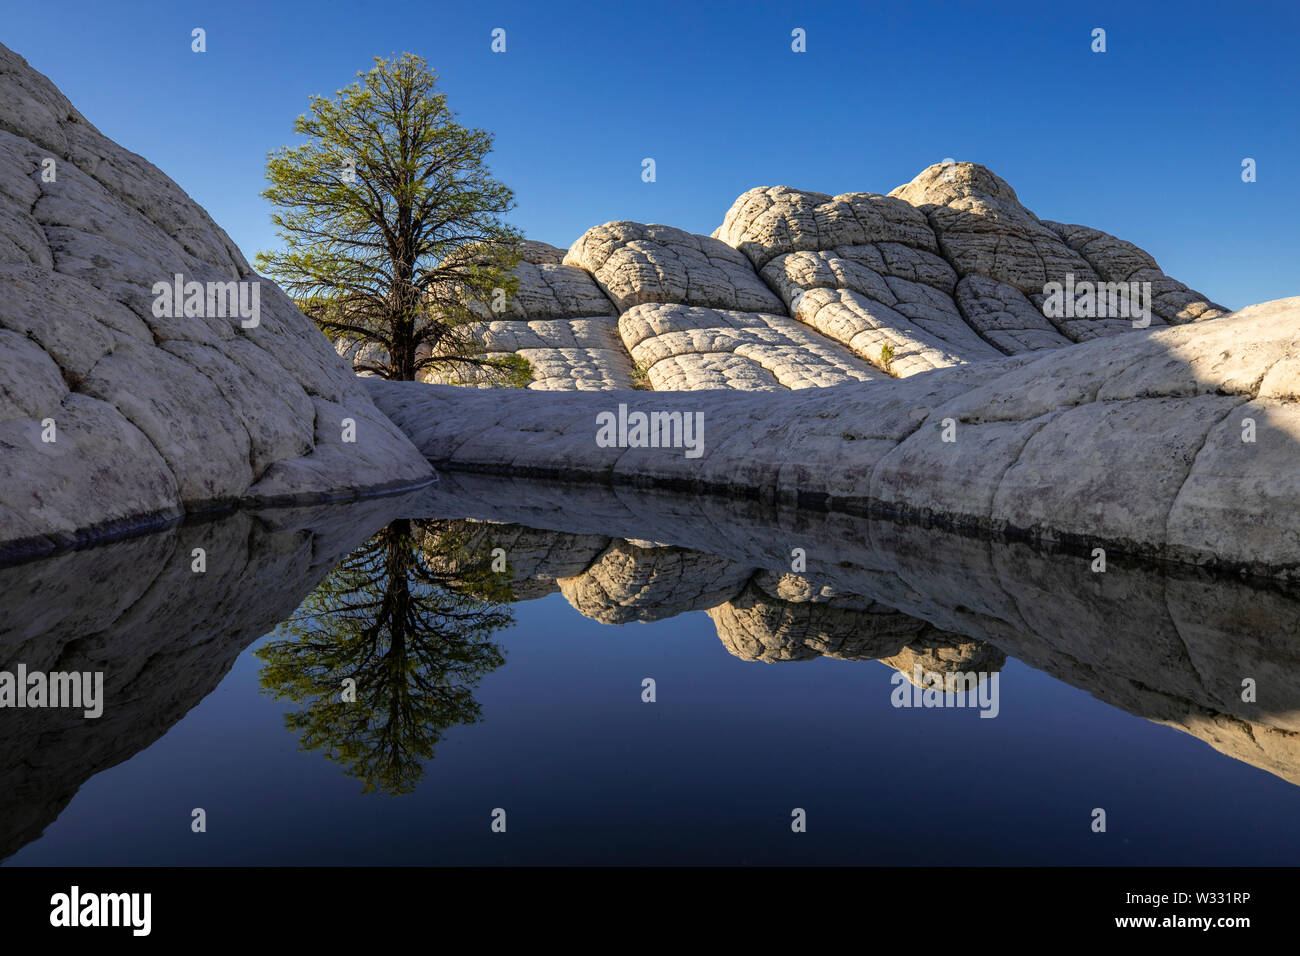 White Pocket in Vermillion Cliffs National Monument, Arizona, United States of America Stock Photo